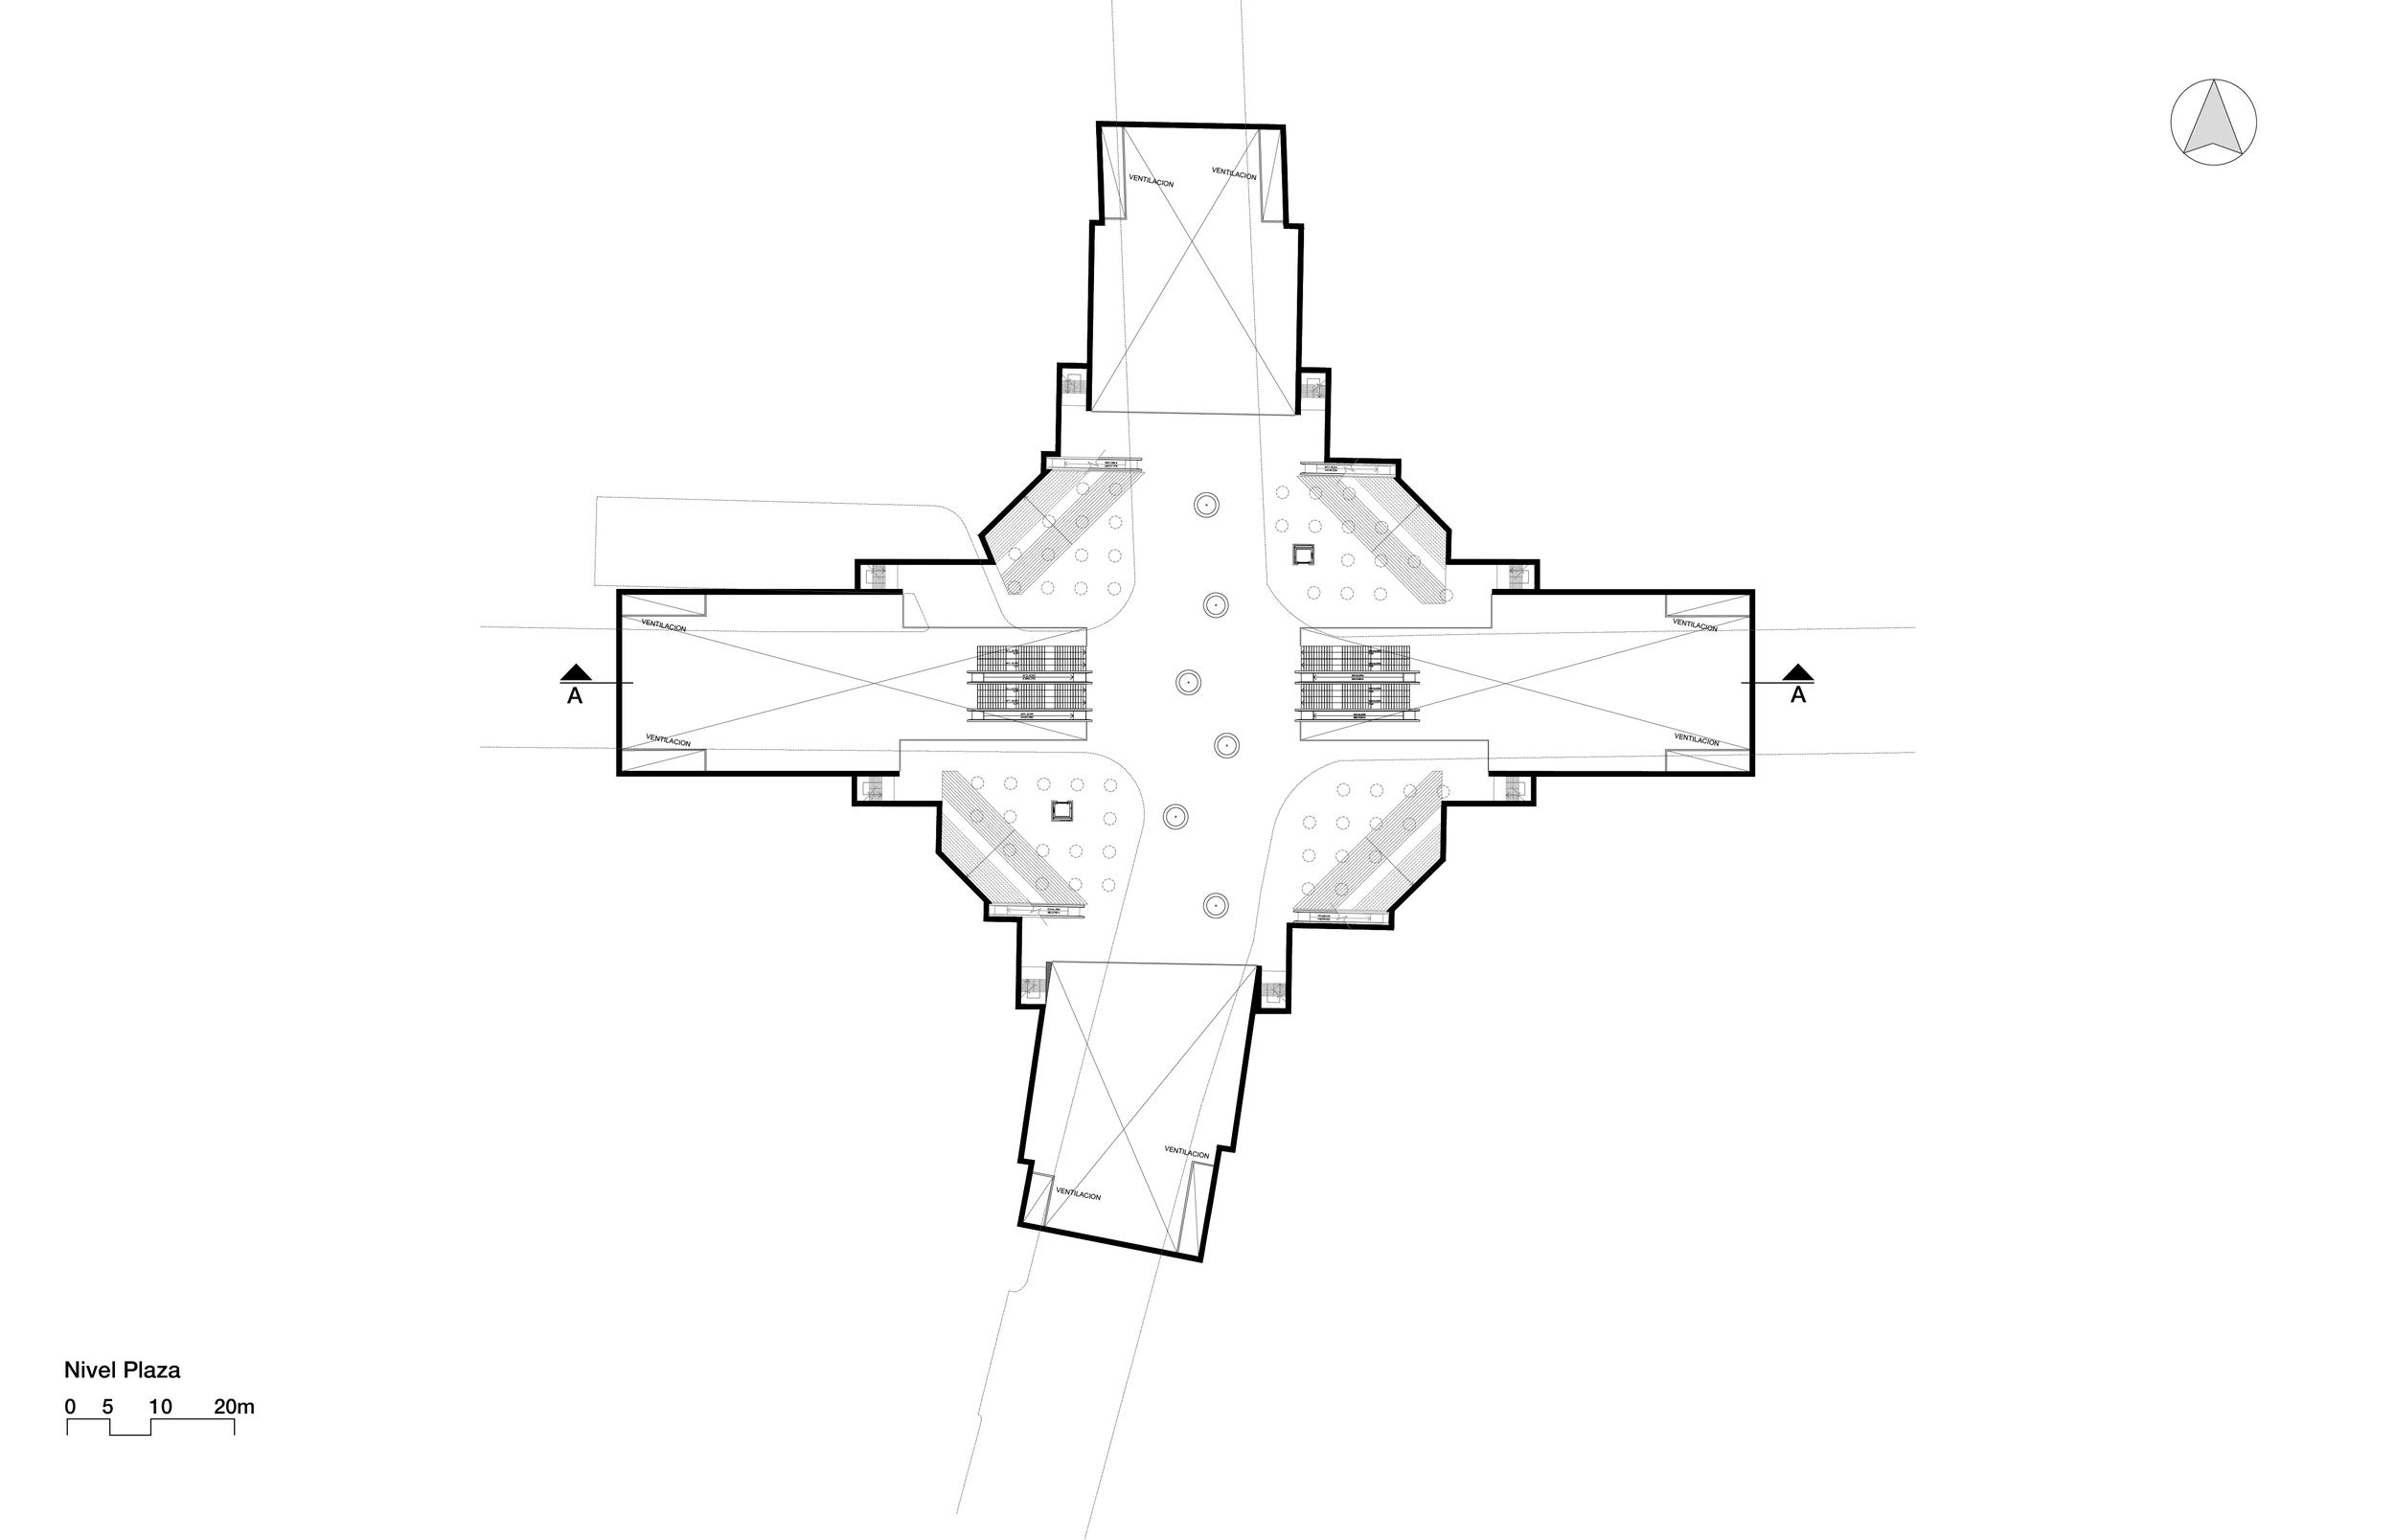 PLANTAS-02.jpg